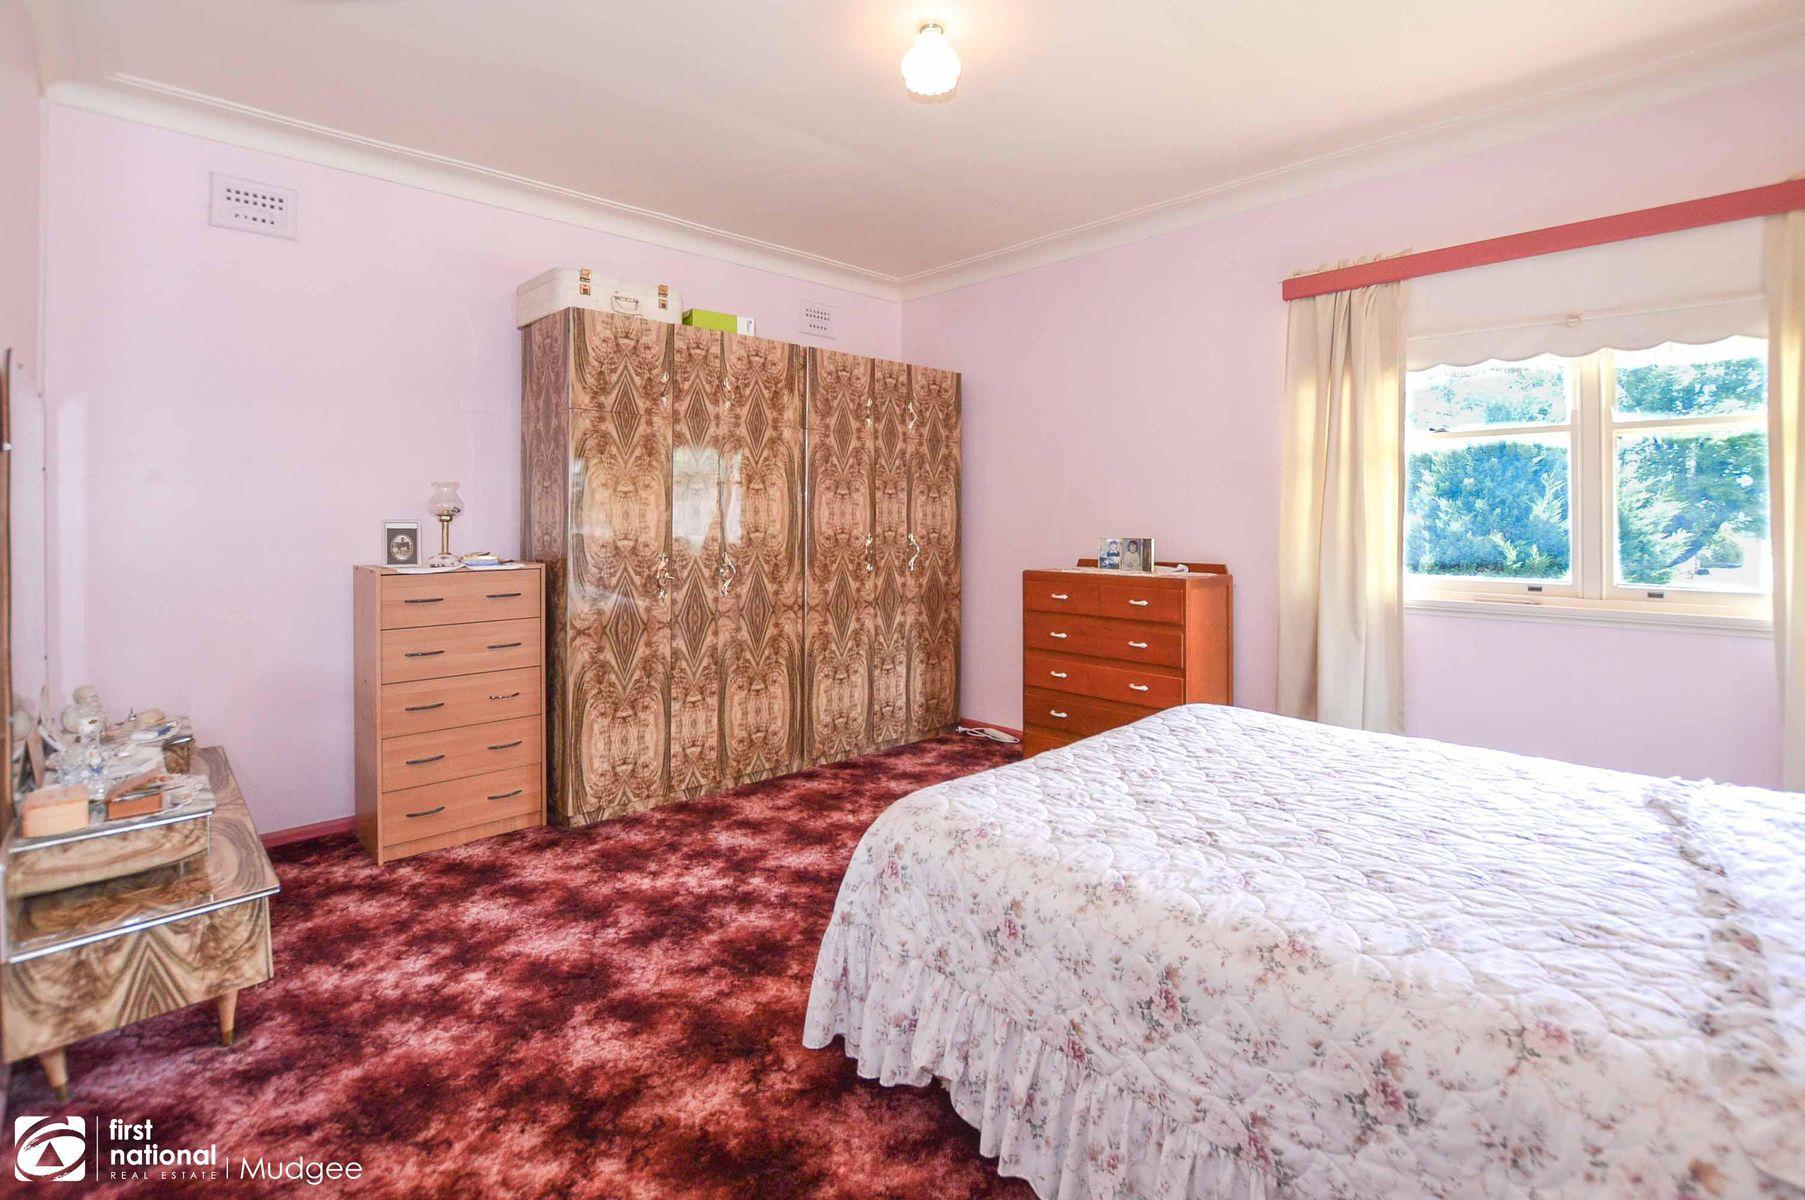 46 George Street, Mudgee, NSW 2850